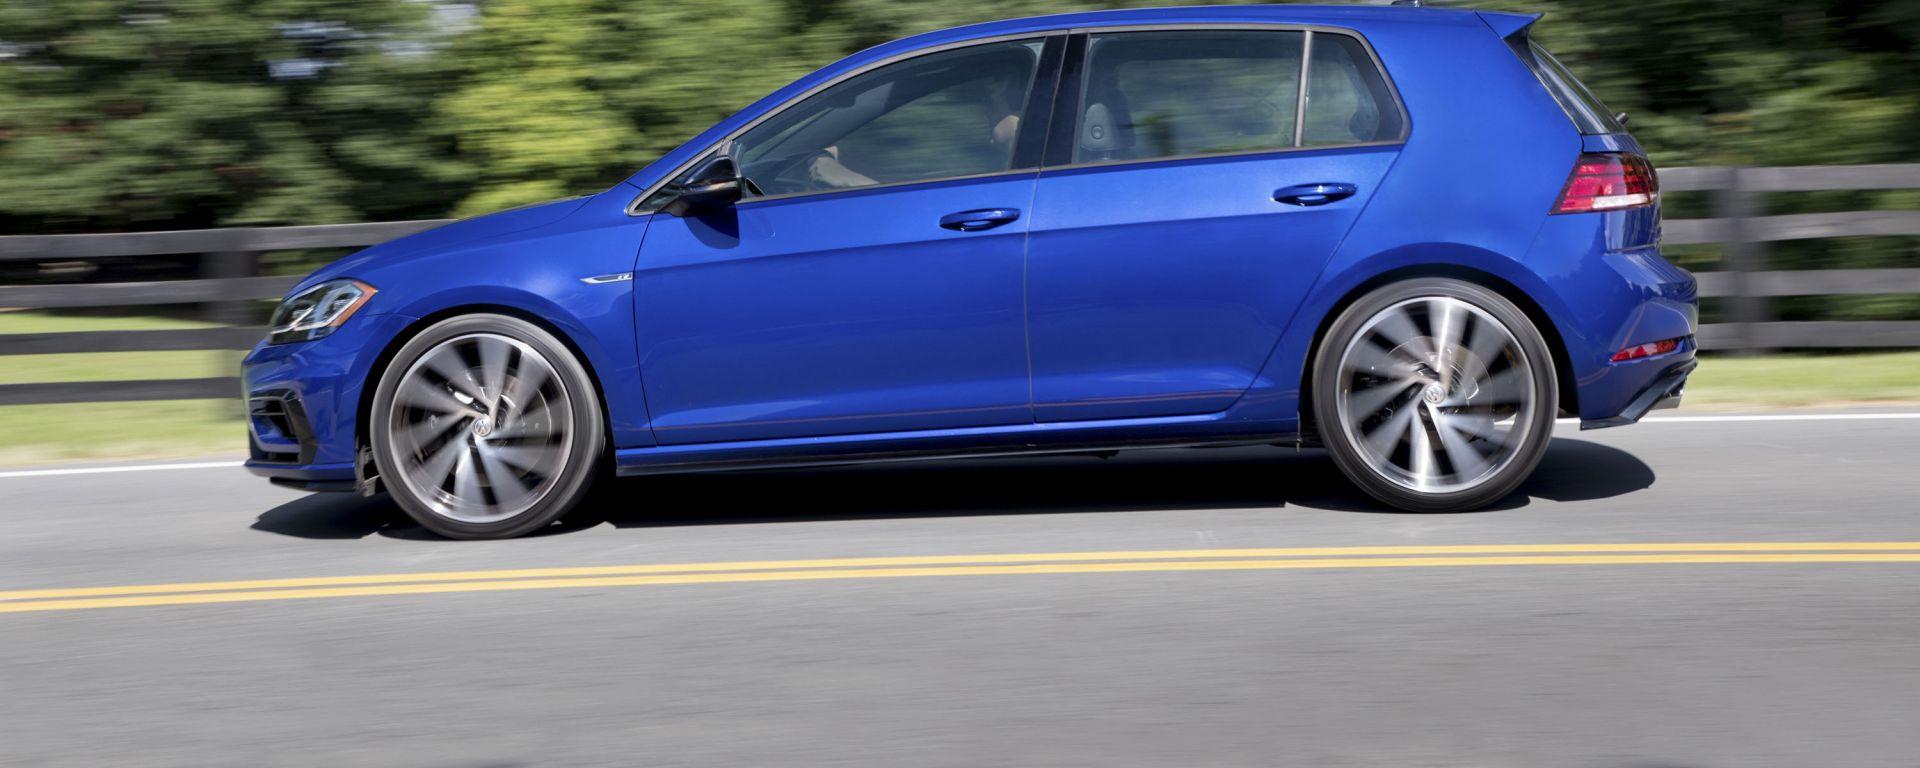 Nuova Volkswagen Golf R, 333 cv di potenza